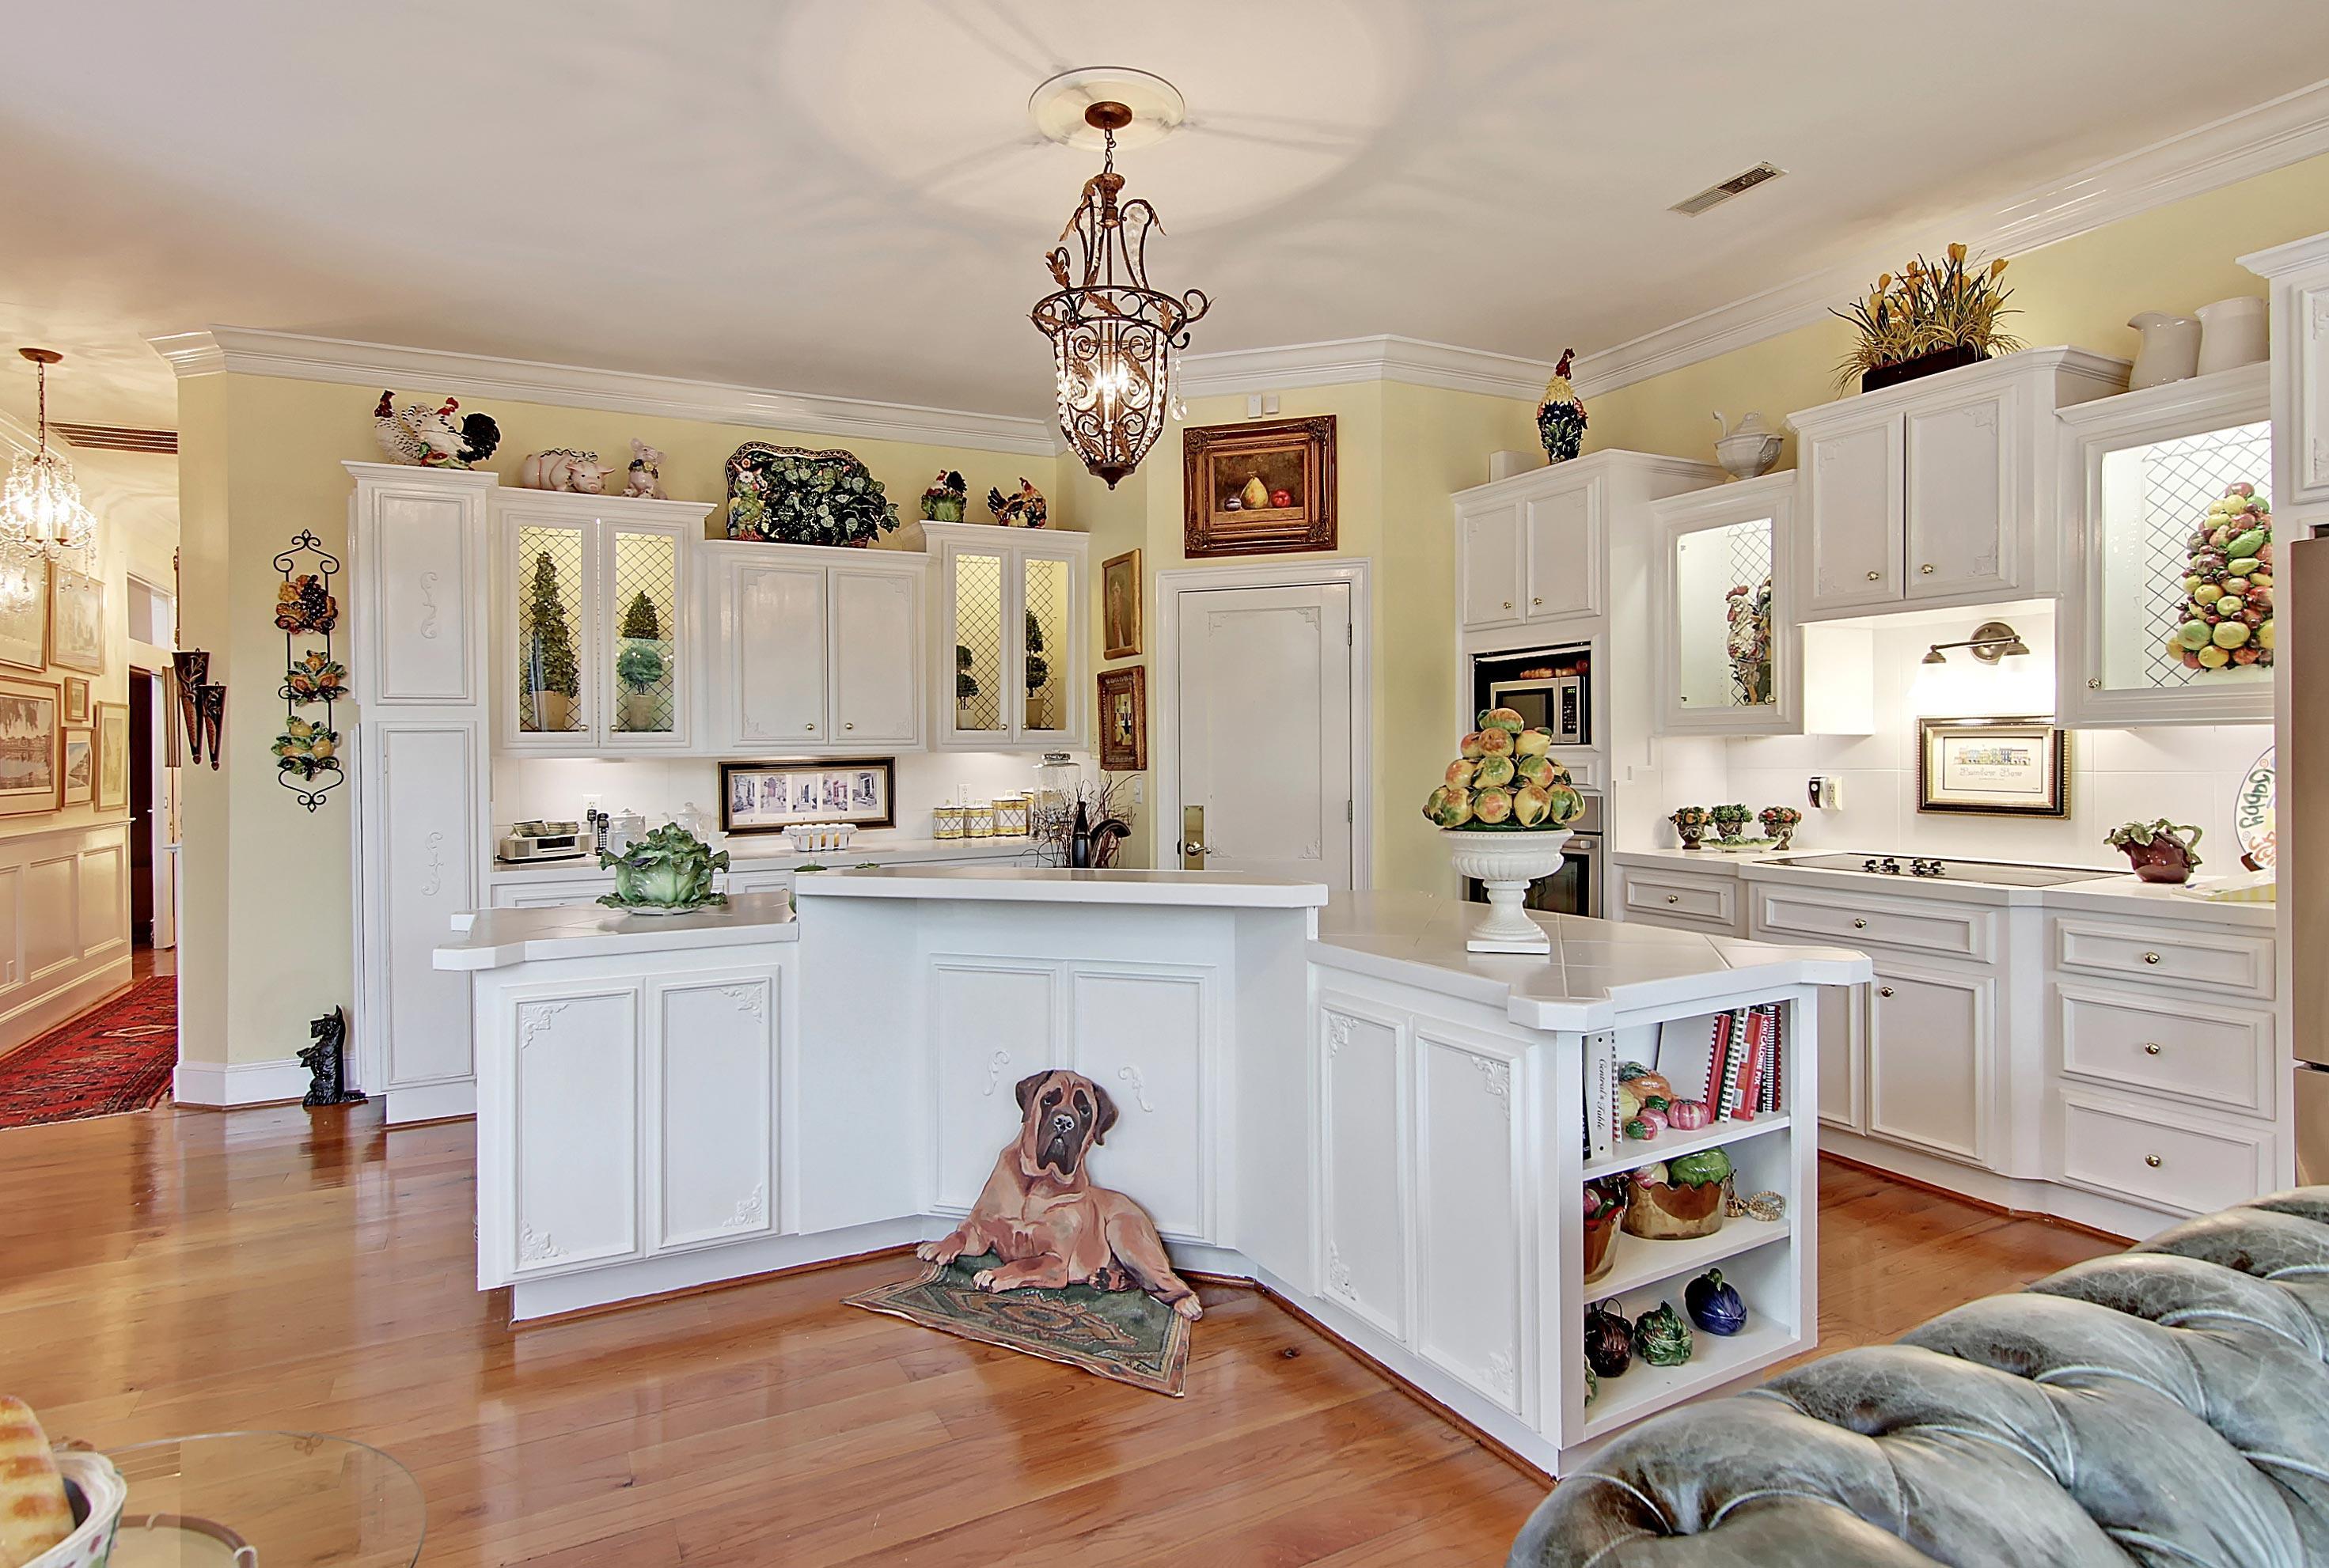 Edgewater Park Homes For Sale - 1323 Edgewater, Charleston, SC - 58